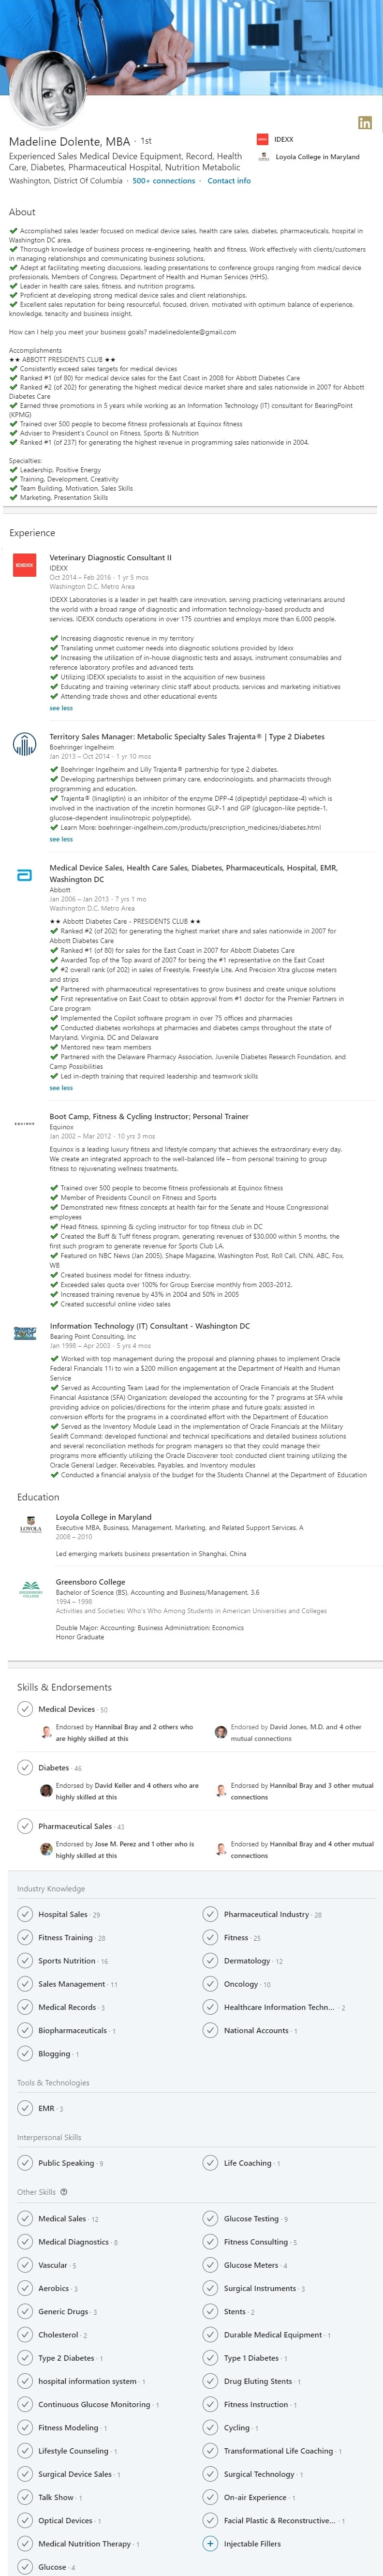 Medical Device Sales LinkedIn Profile Example 1477